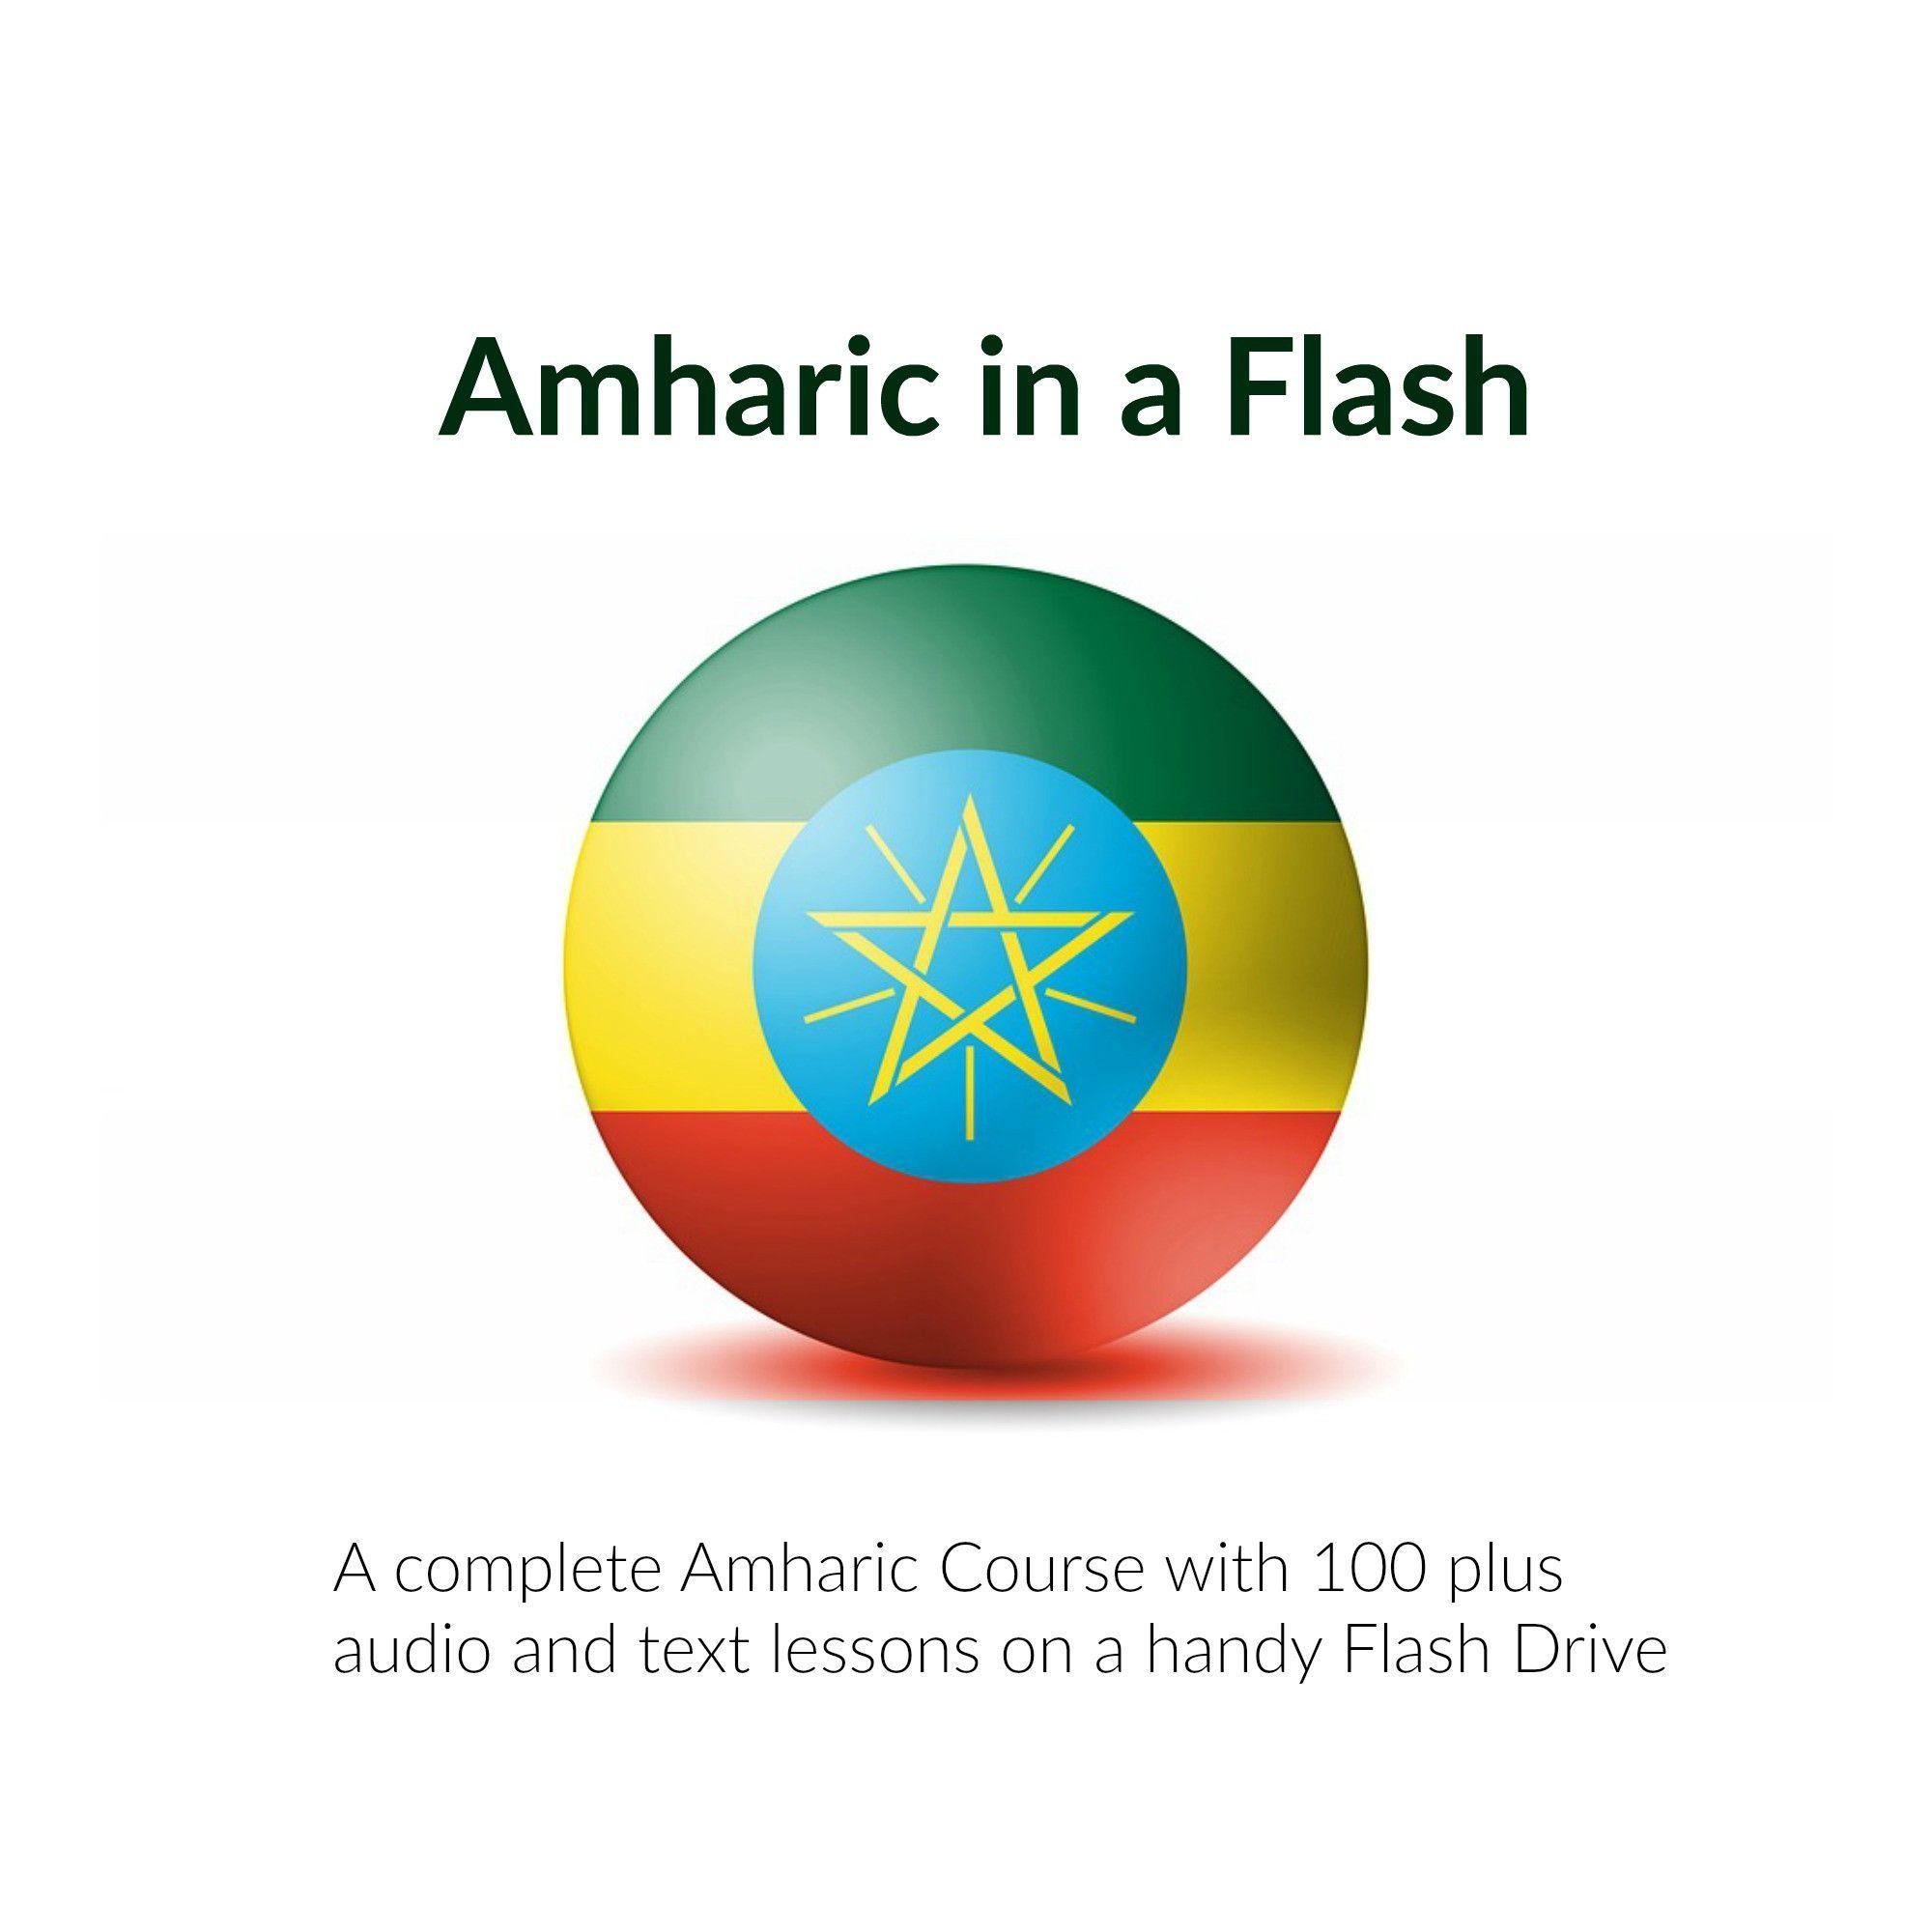 Amharic in a flash amharic language language resources